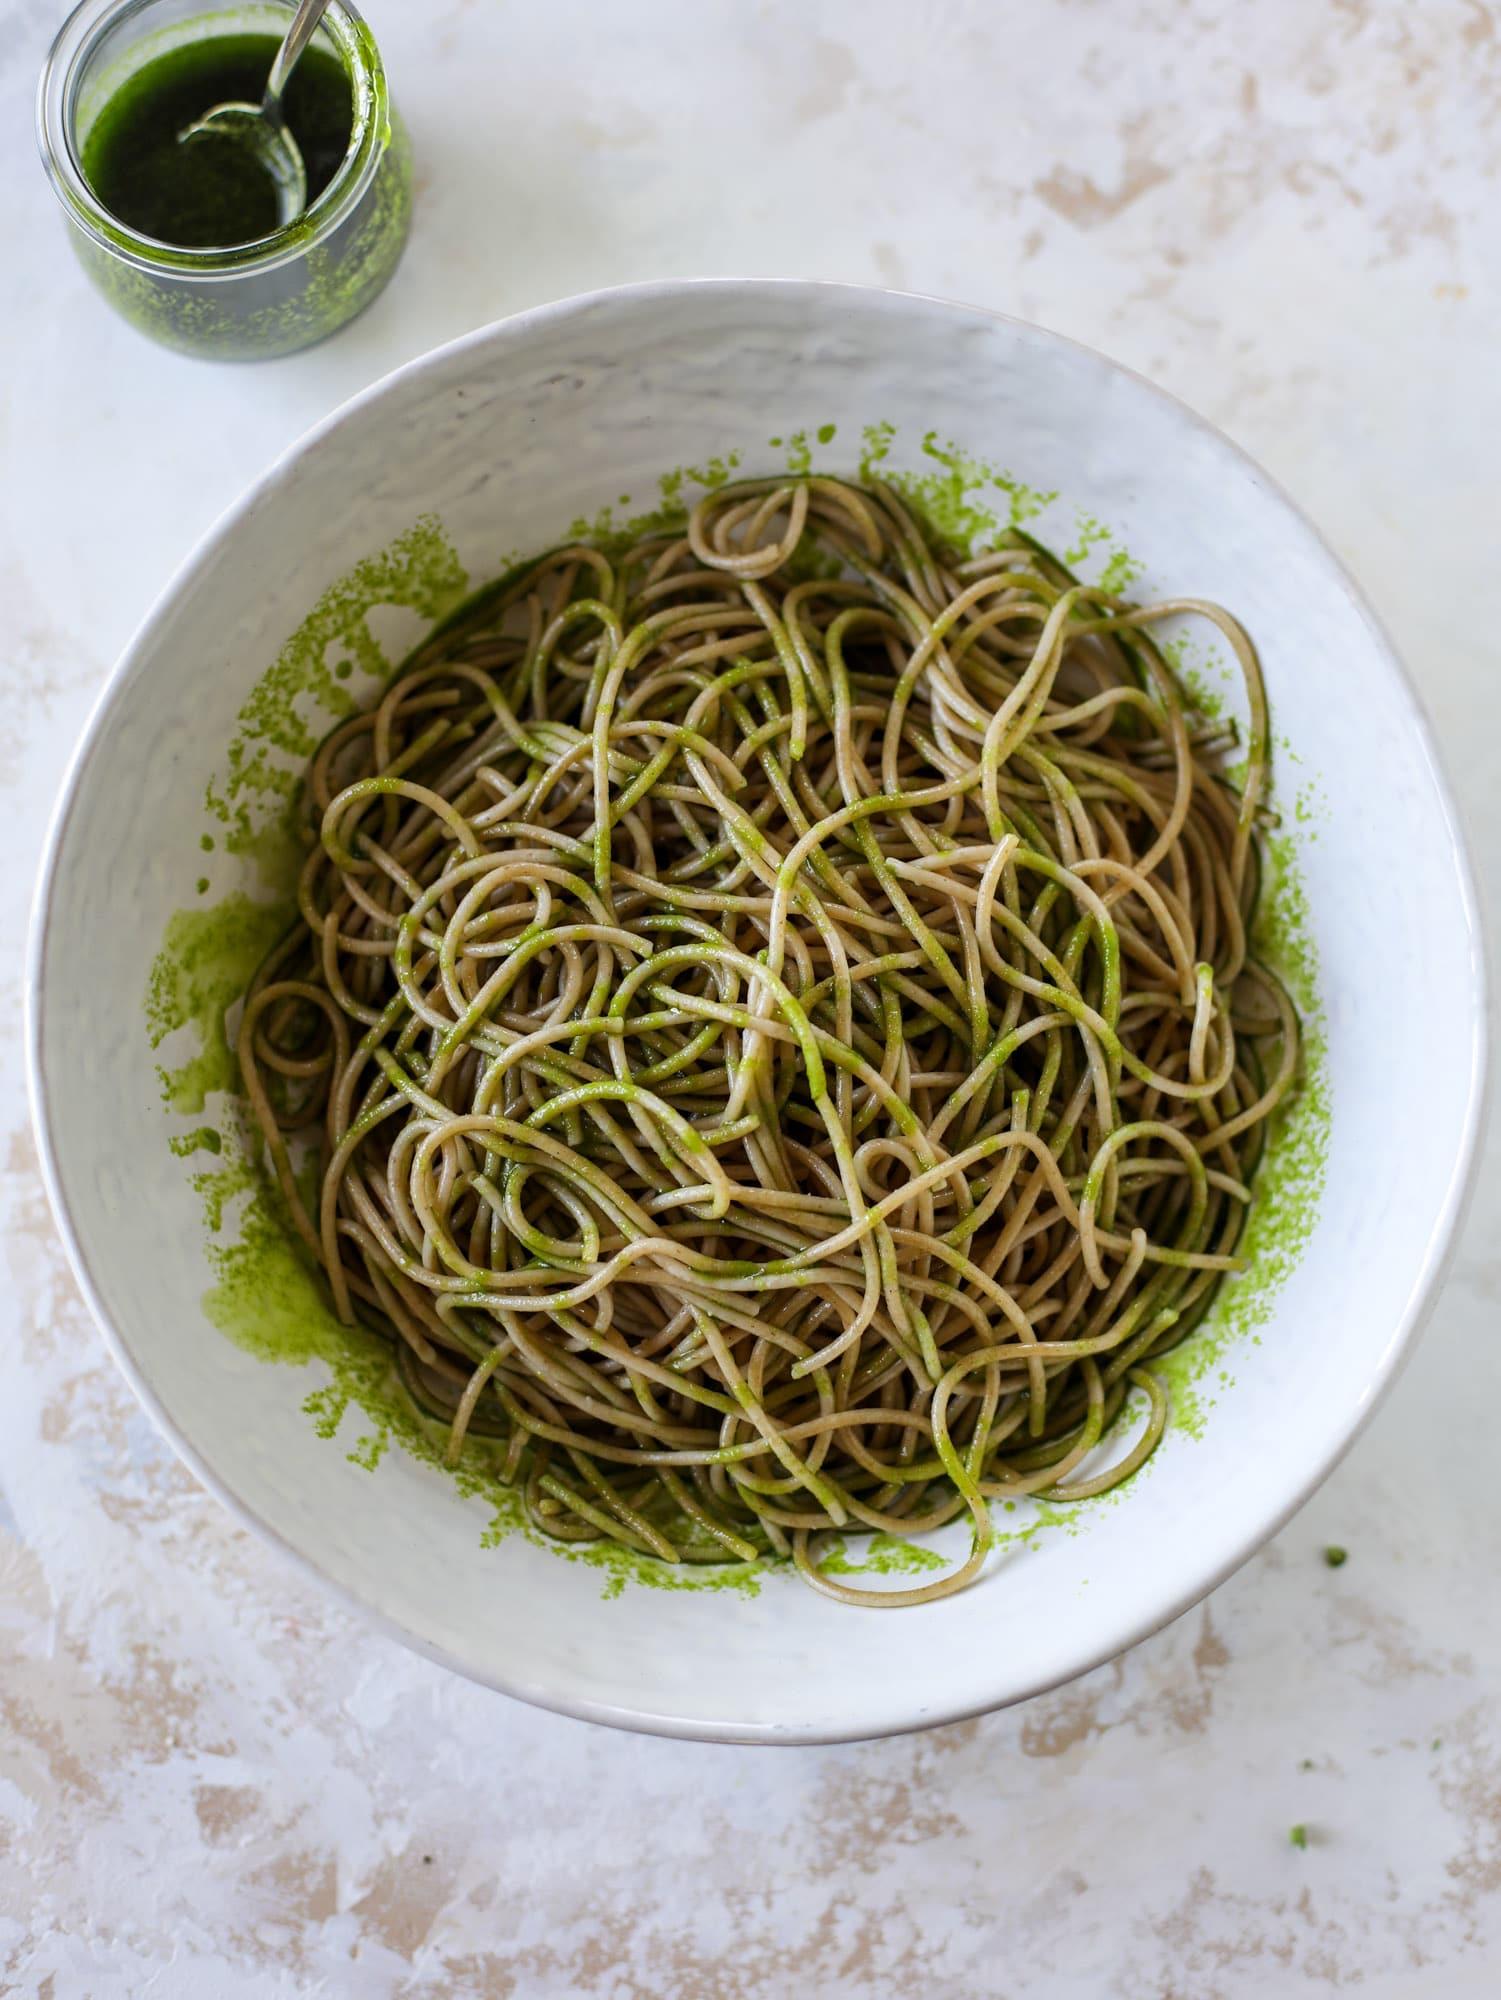 spaghetti tossed in basil oil